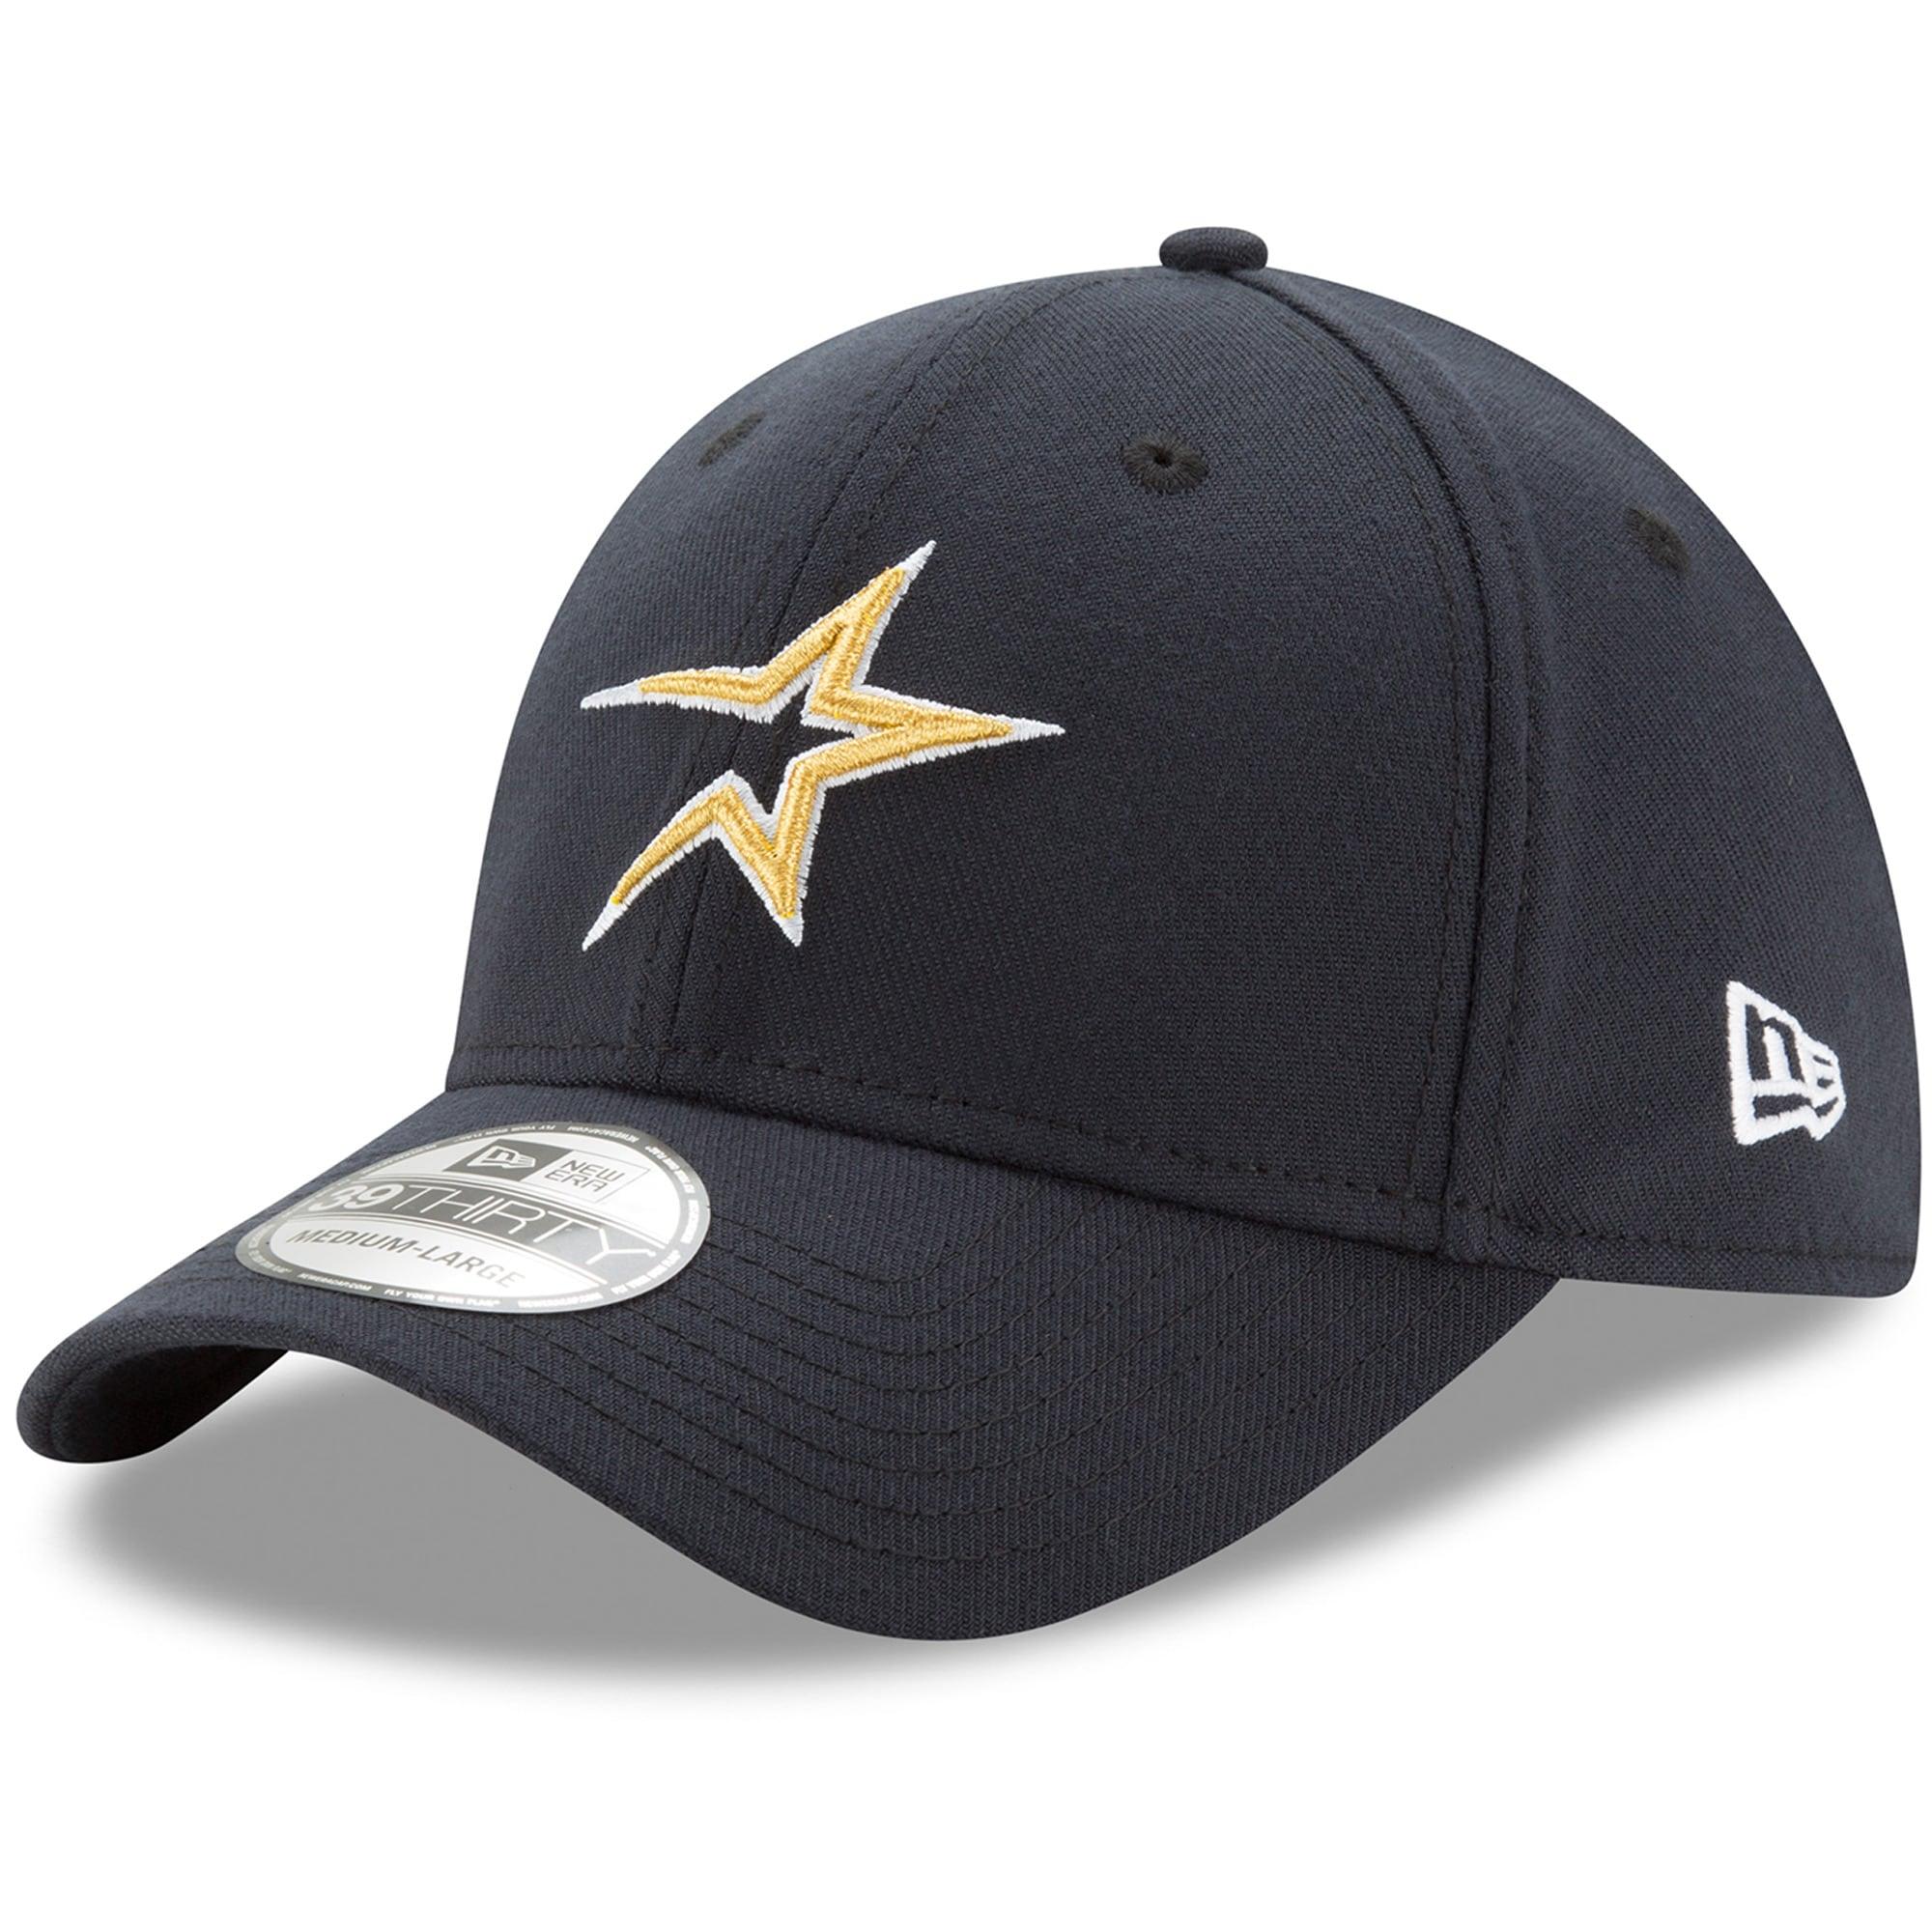 Houston Astros New Era Cooperstown Collection Team Classic 39THIRTY Flex Hat - Navy